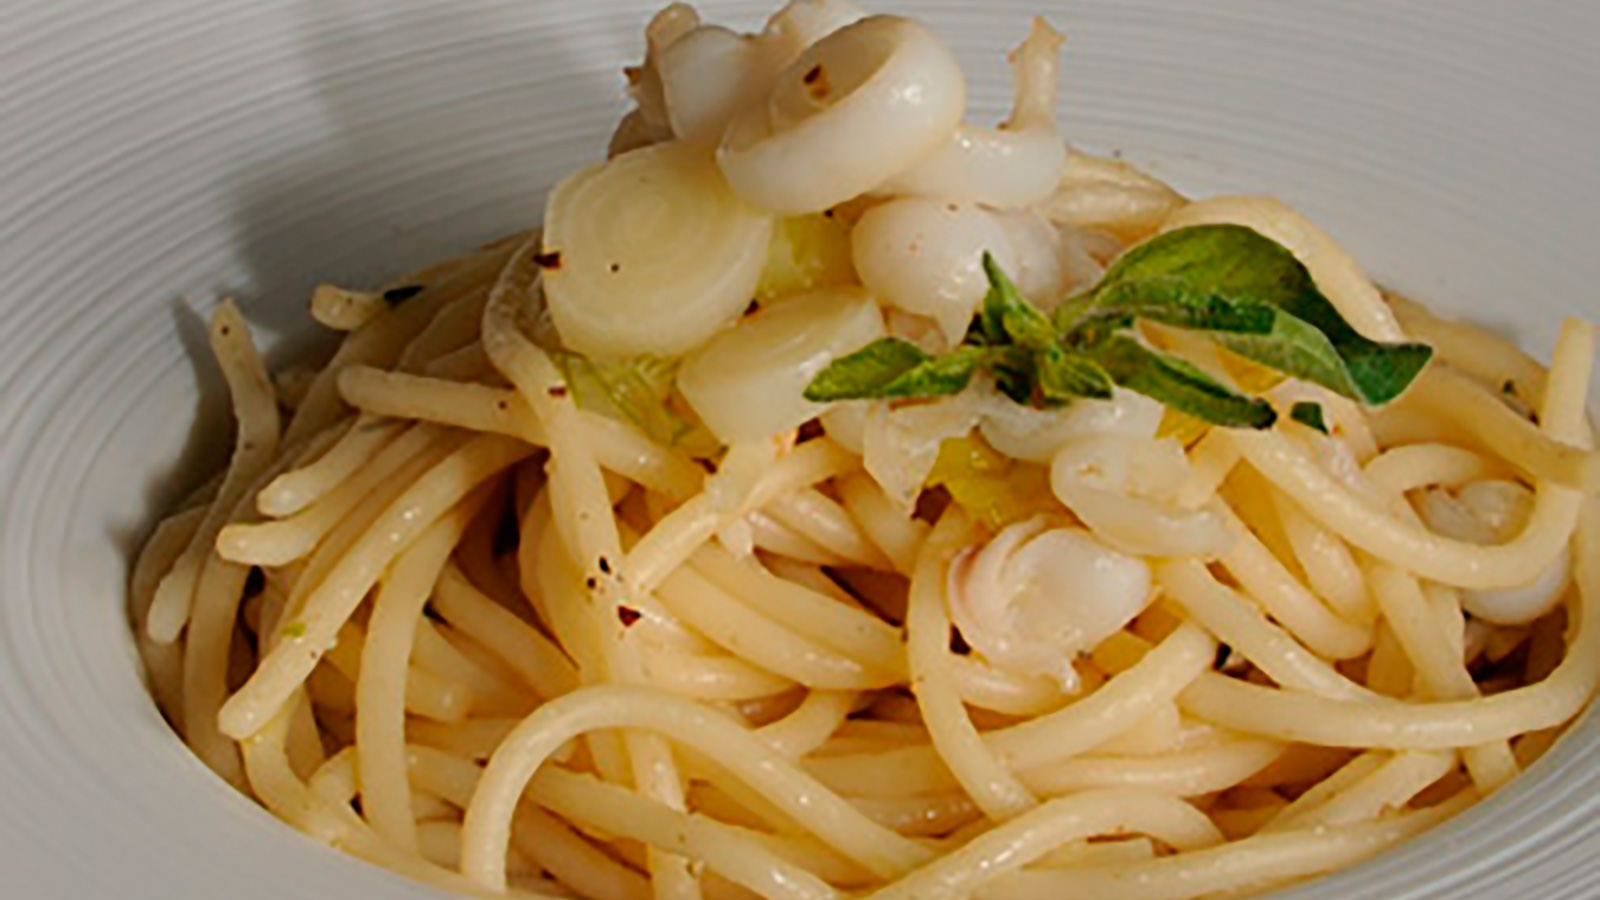 Espaguetis con calamares diana cabrera receta canal for Diana cabrera canal cocina